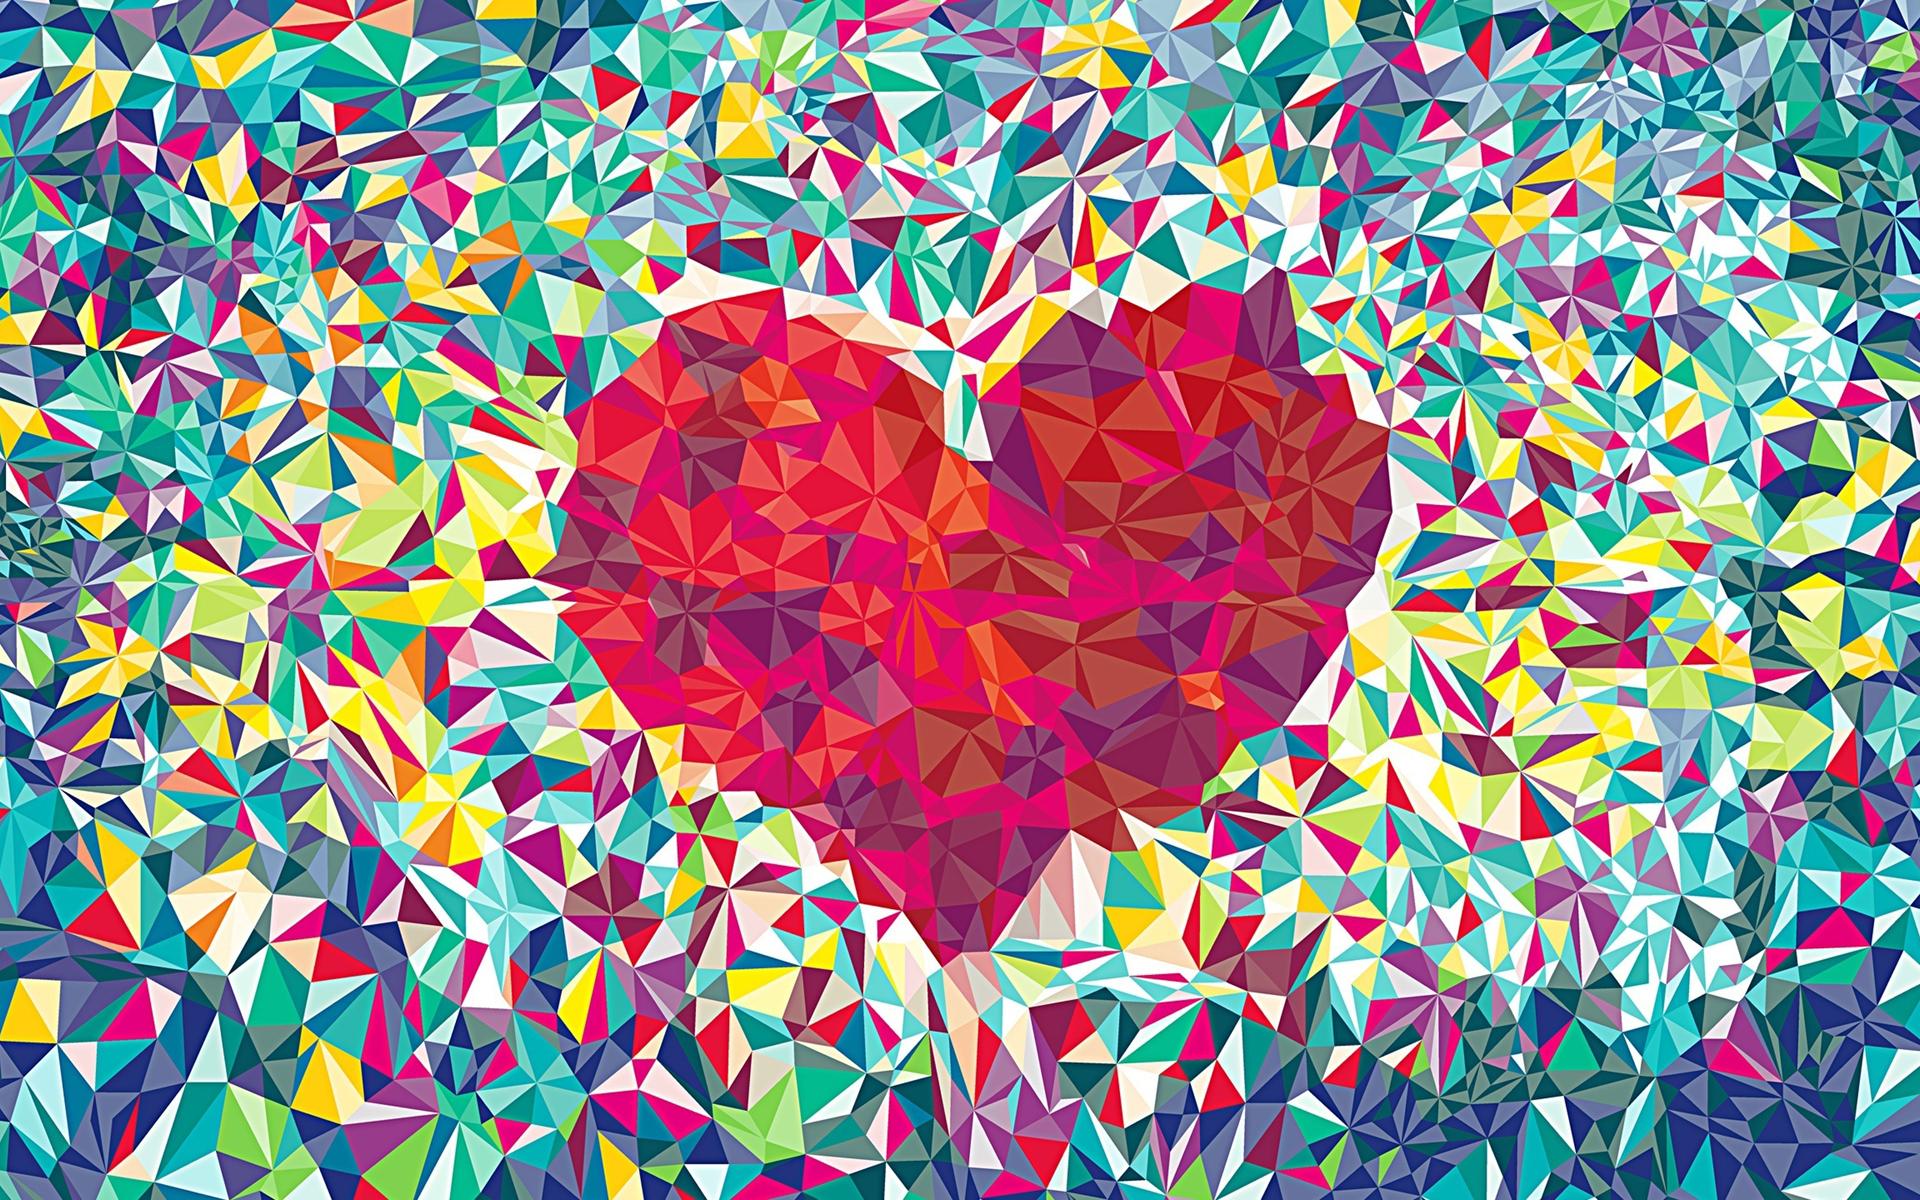 Love Wallpapers Of 192 Pixels : Pixel Wallpapers HD - WallpaperSafari